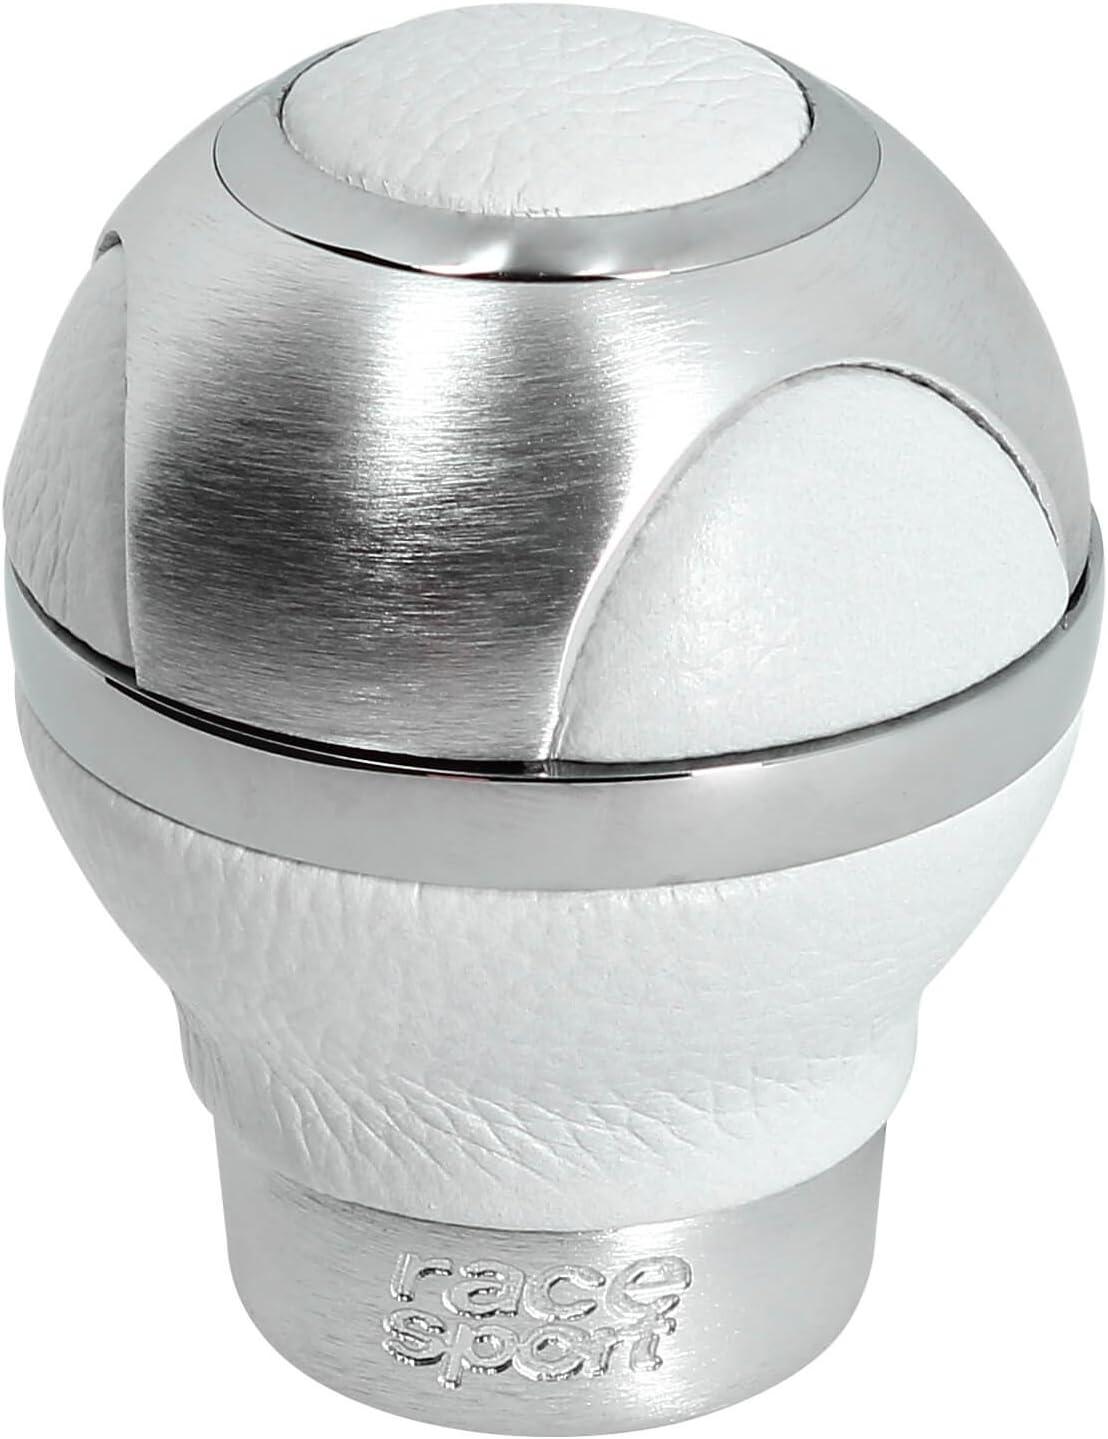 Blanco PielClassic Sumex 800086W Pomo Cambio Alu